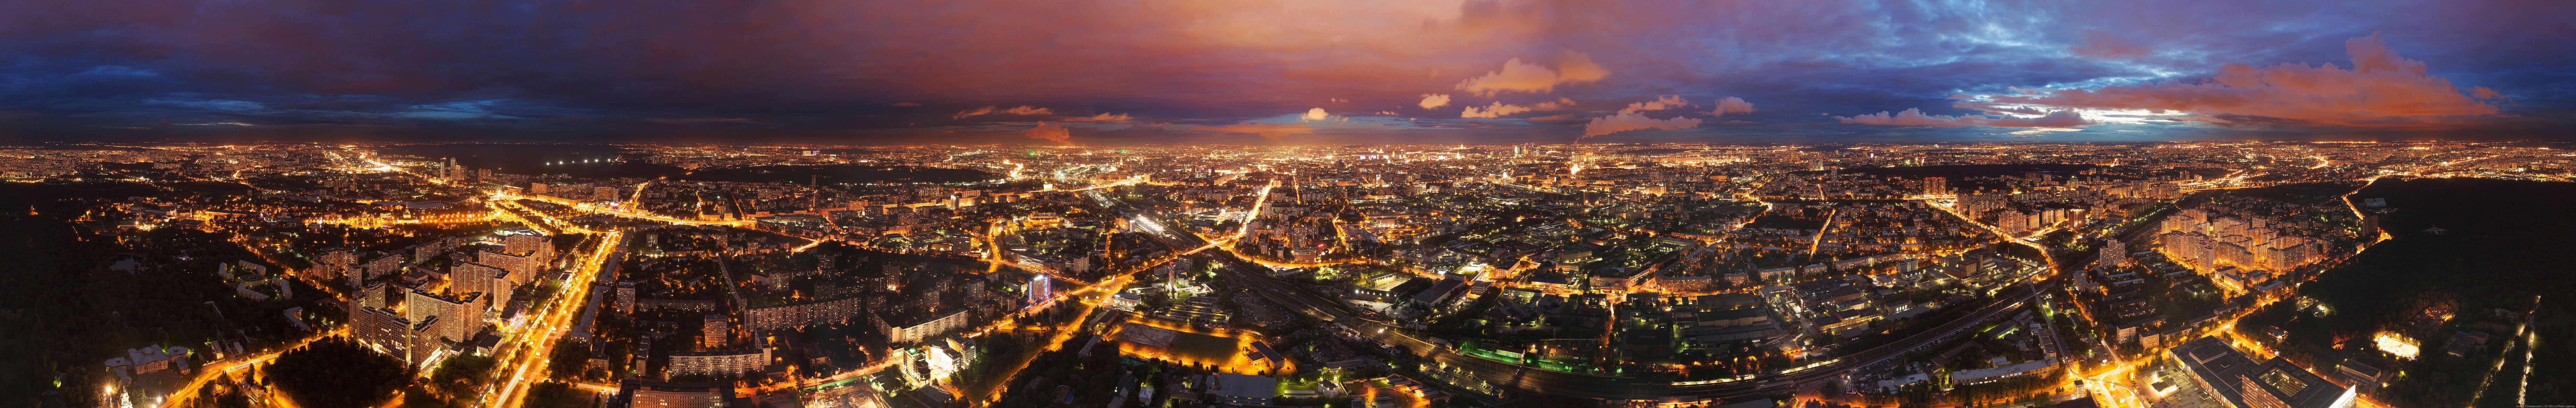 панорамные фото магнитогорска